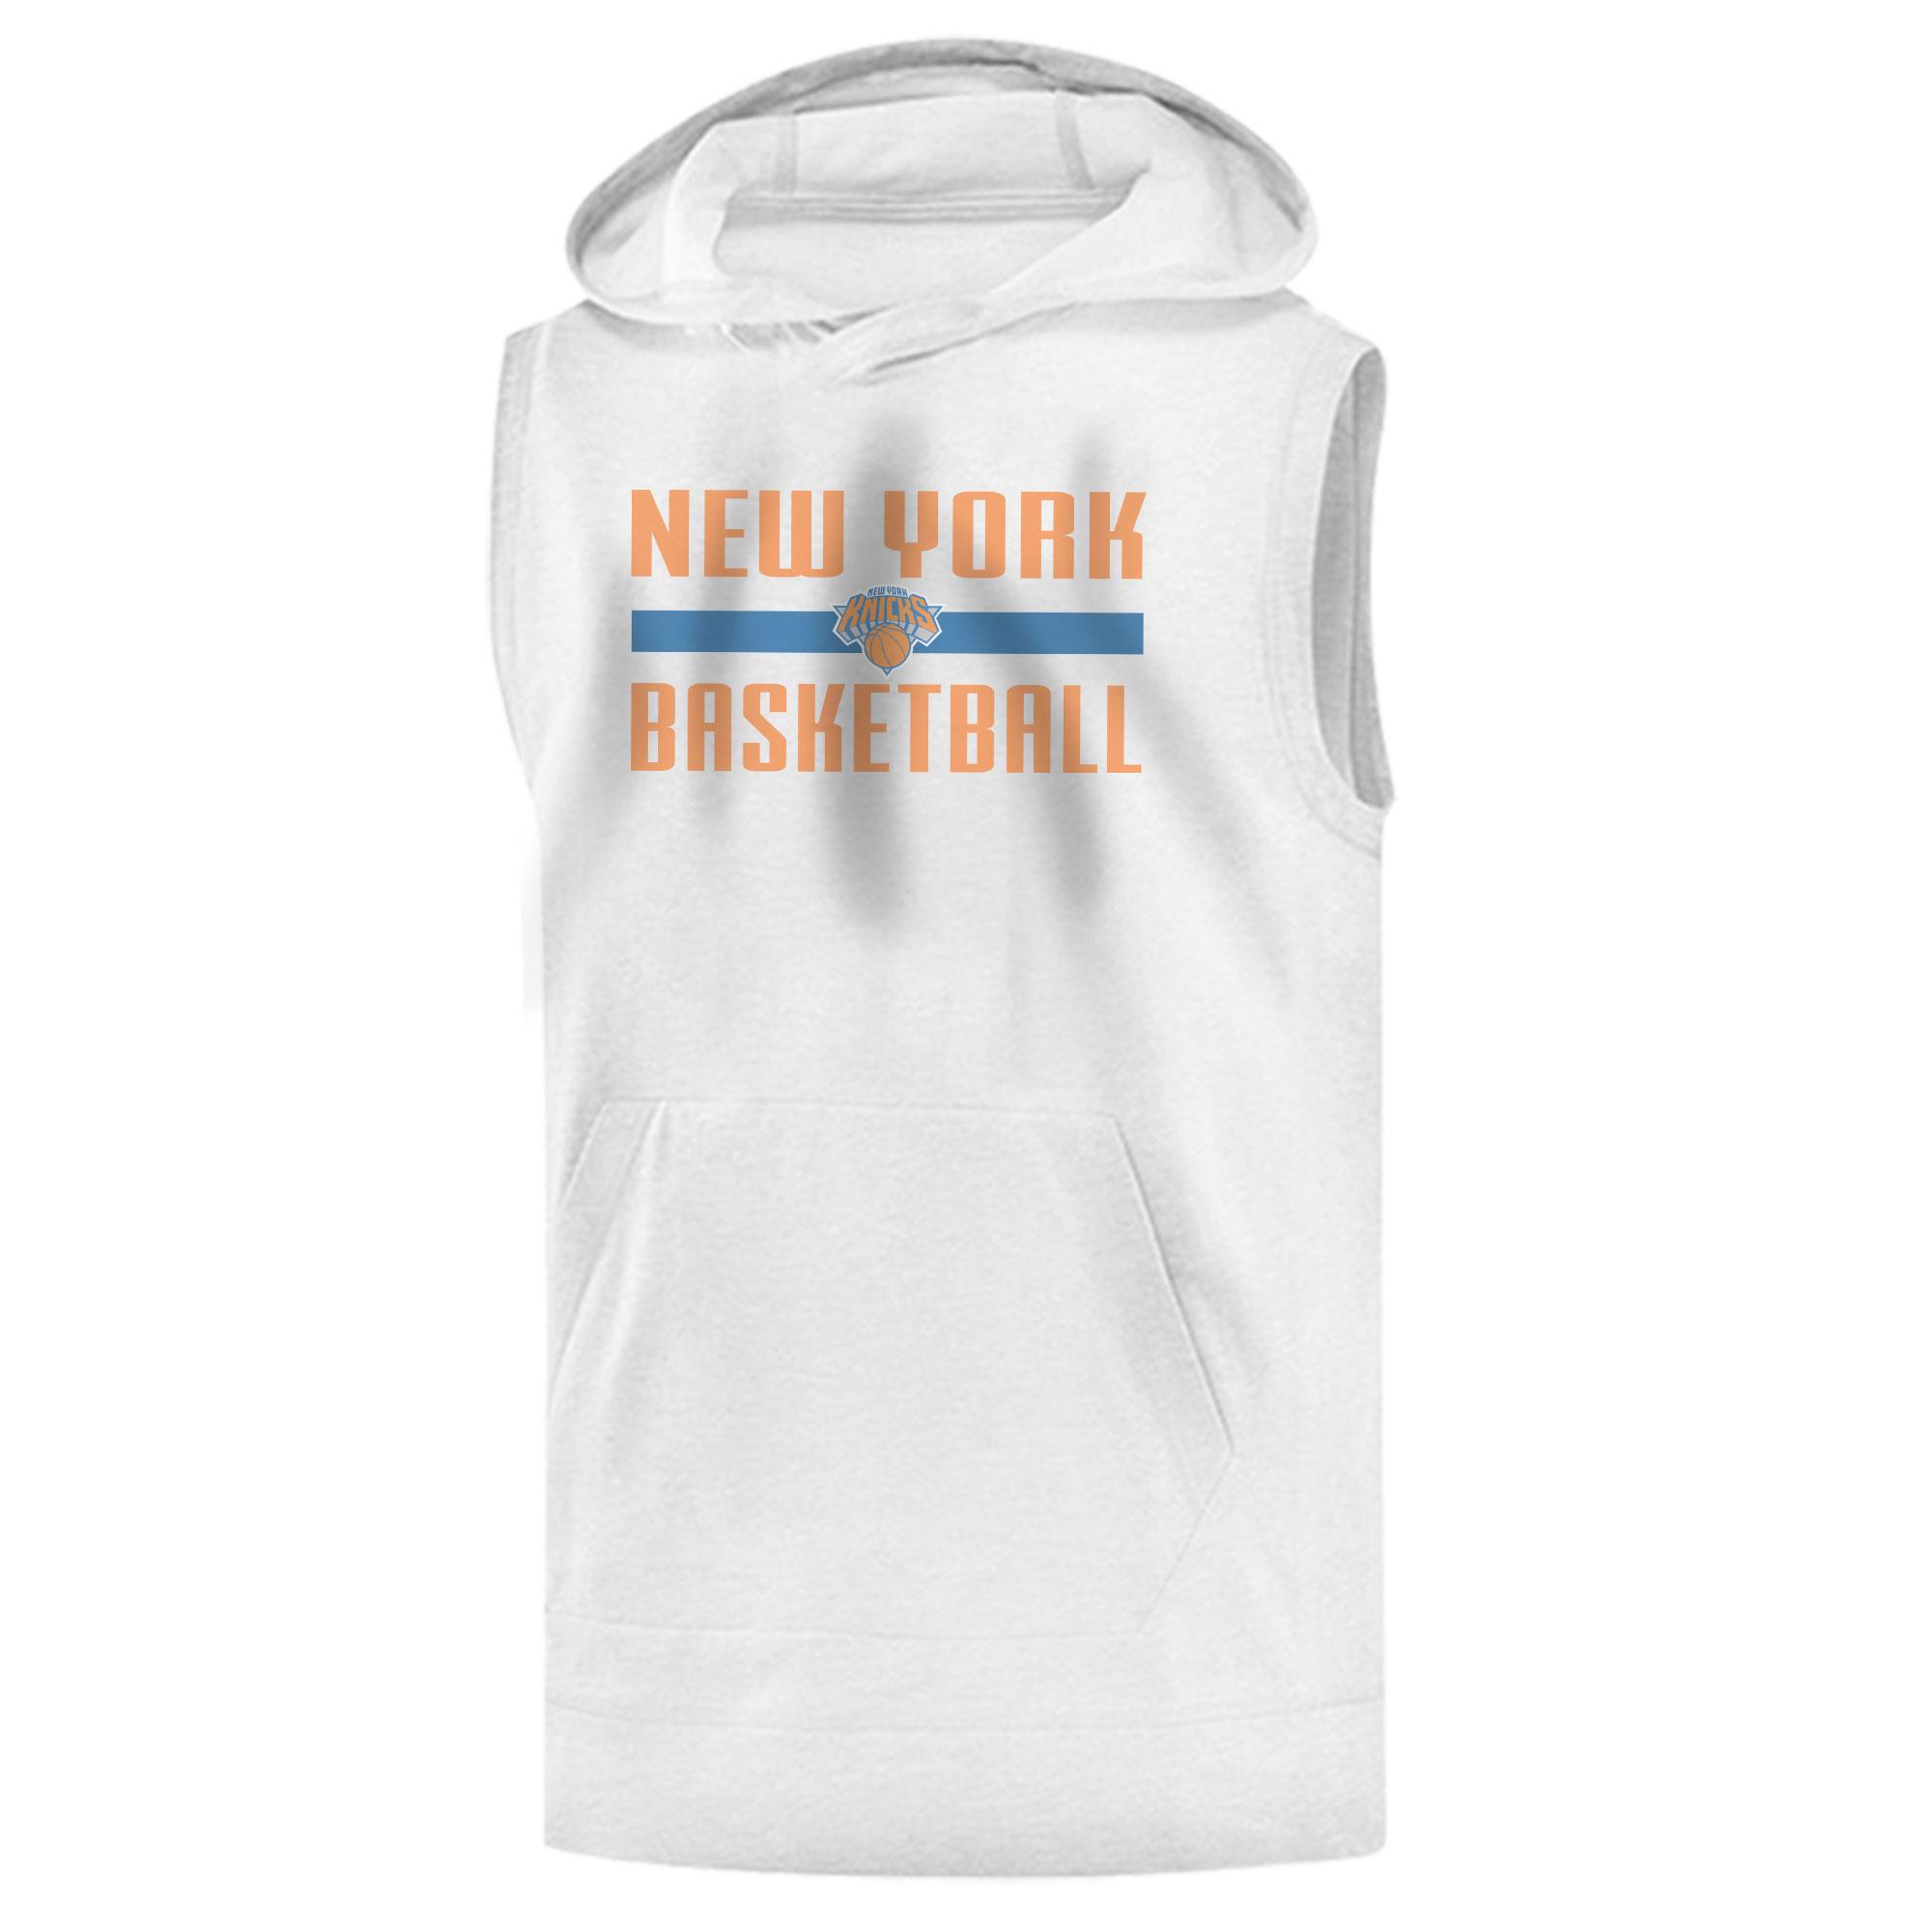 New York Knicks Basketball Sleeveless (KLS-WHT-NP-knicks-bsktbll-531)